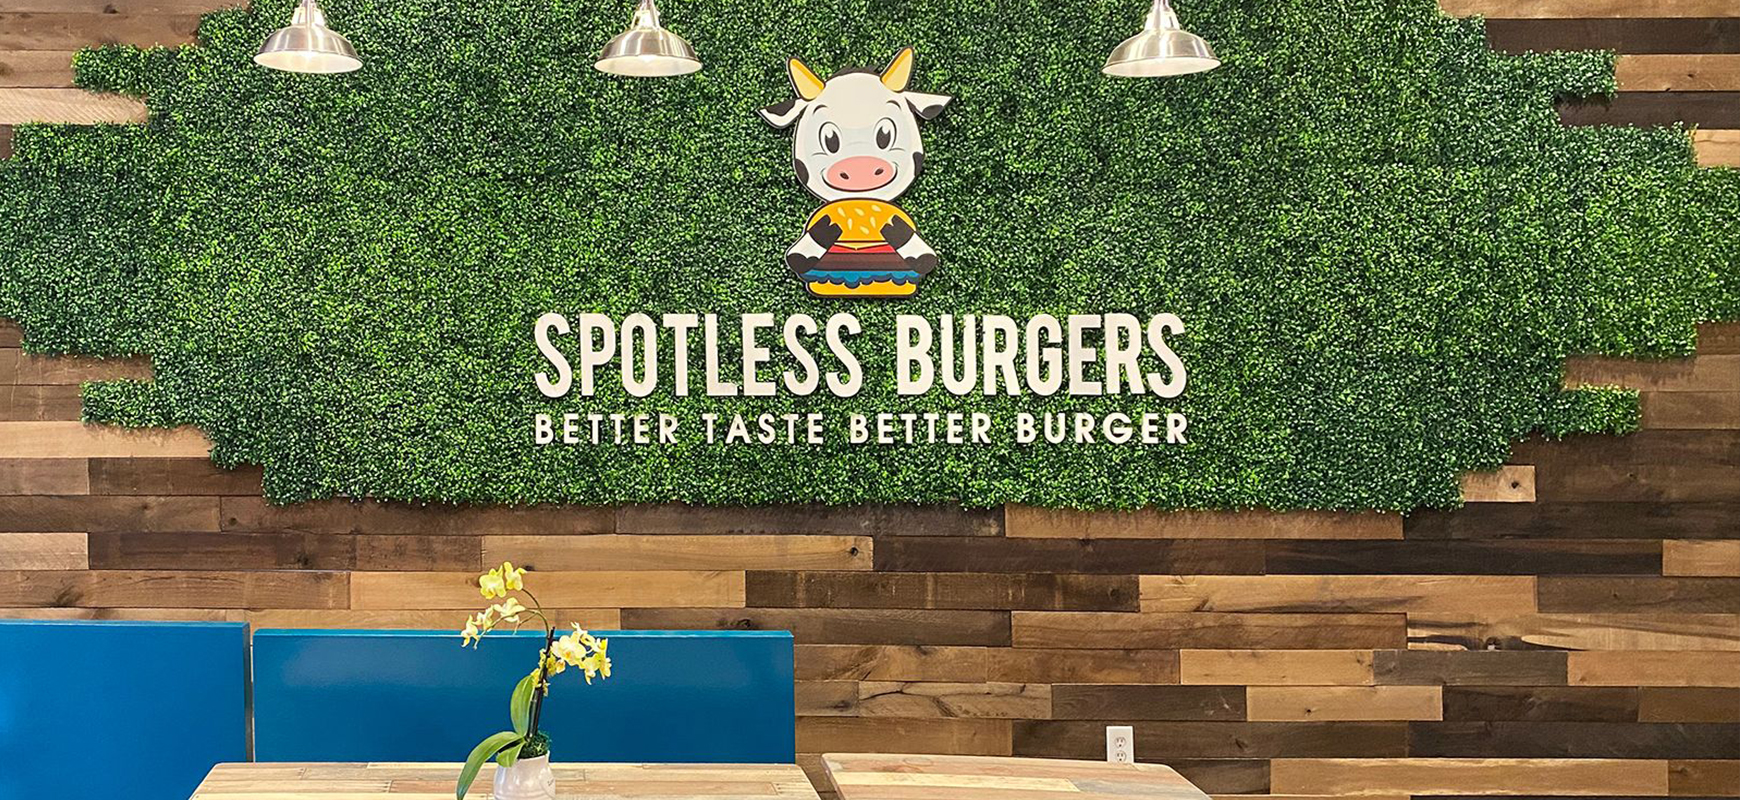 spotless-burger-3d-letters